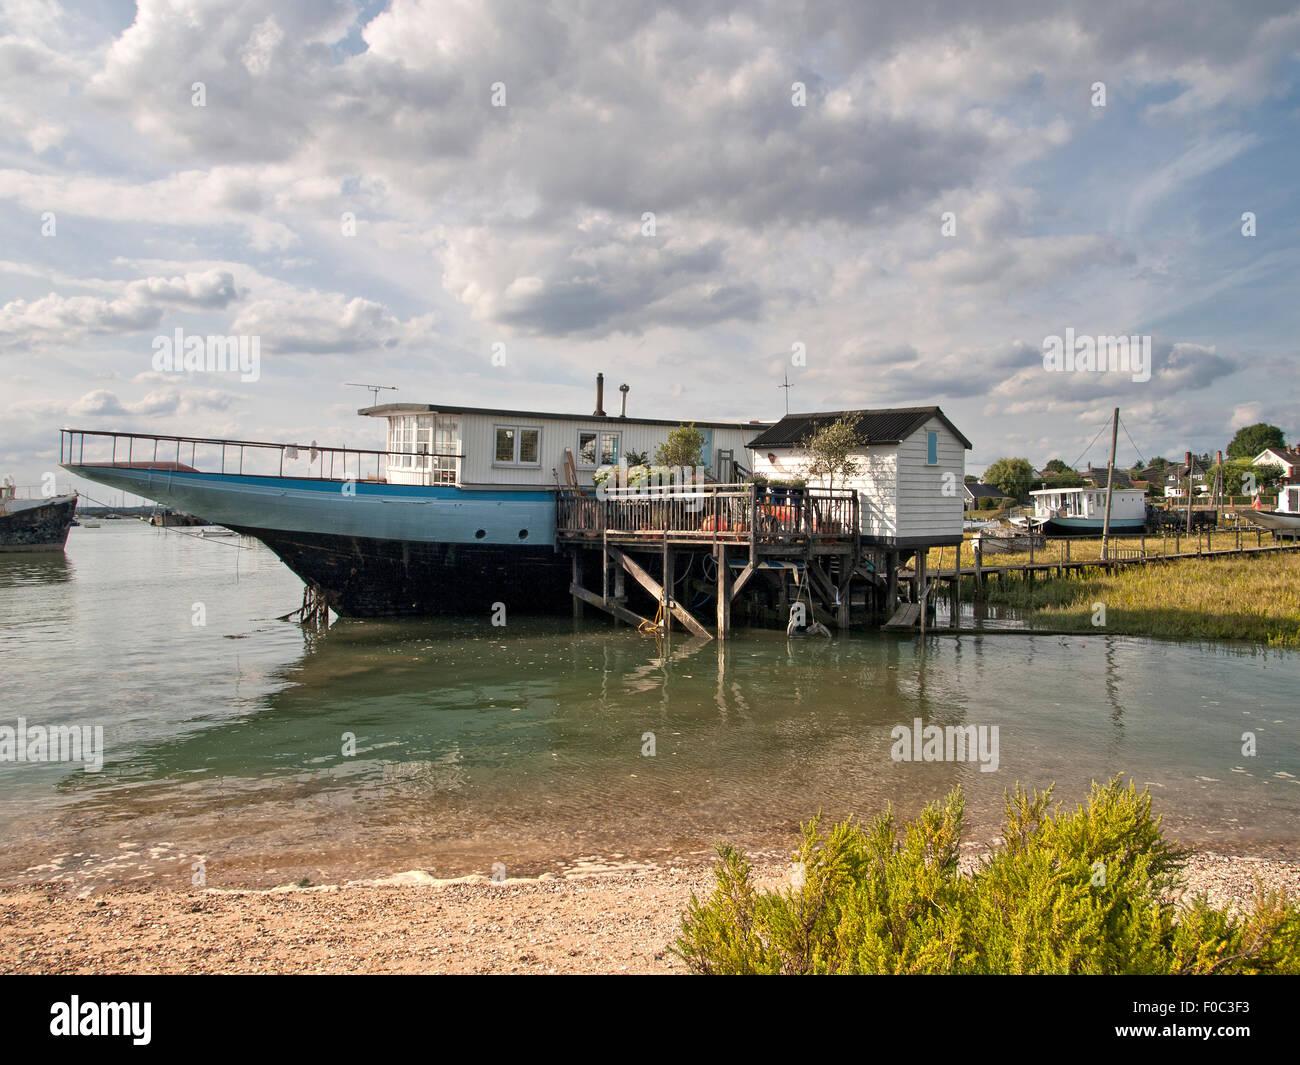 Houseboats on shoreline at West Mersea. Mersea Island. Essex. England. UK. - Stock Image